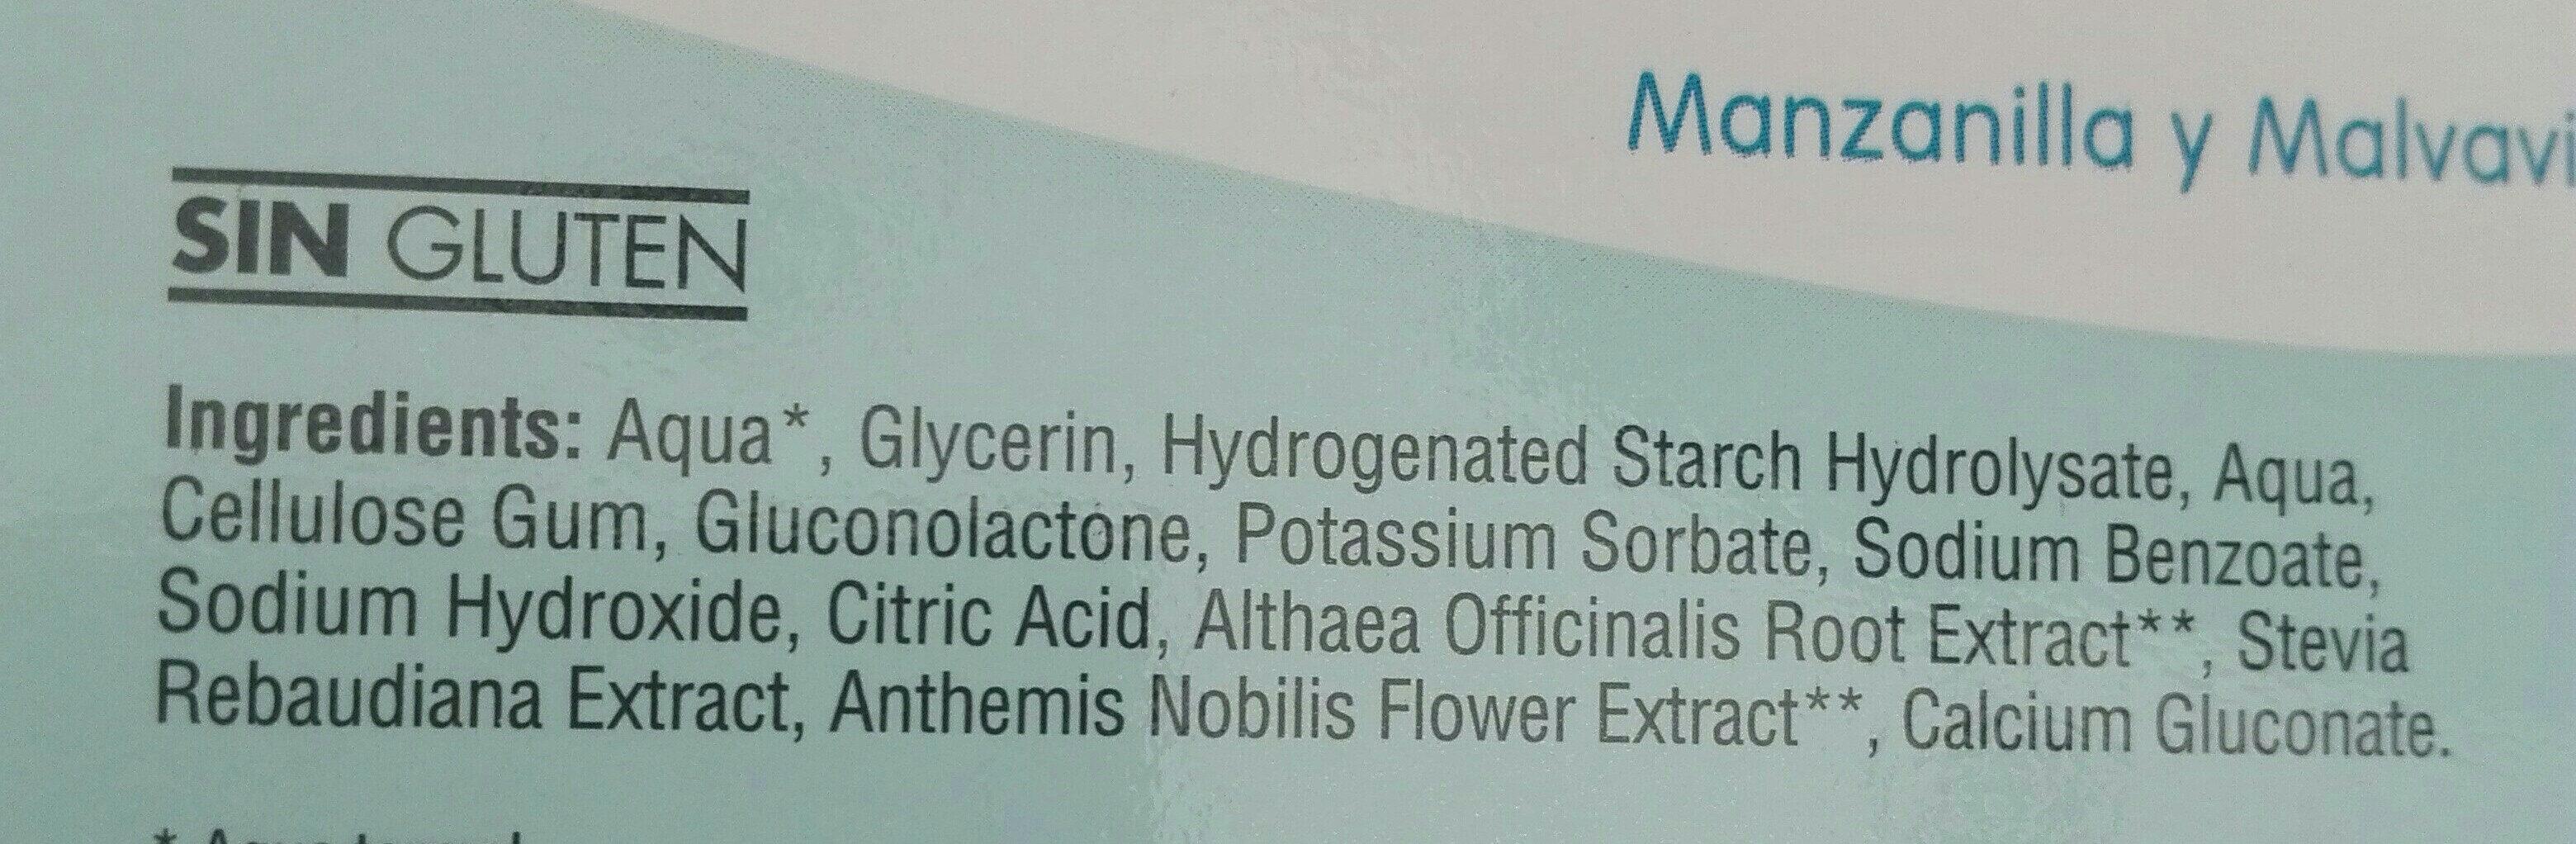 Bebé bálsamo gingival - Ingredients - es